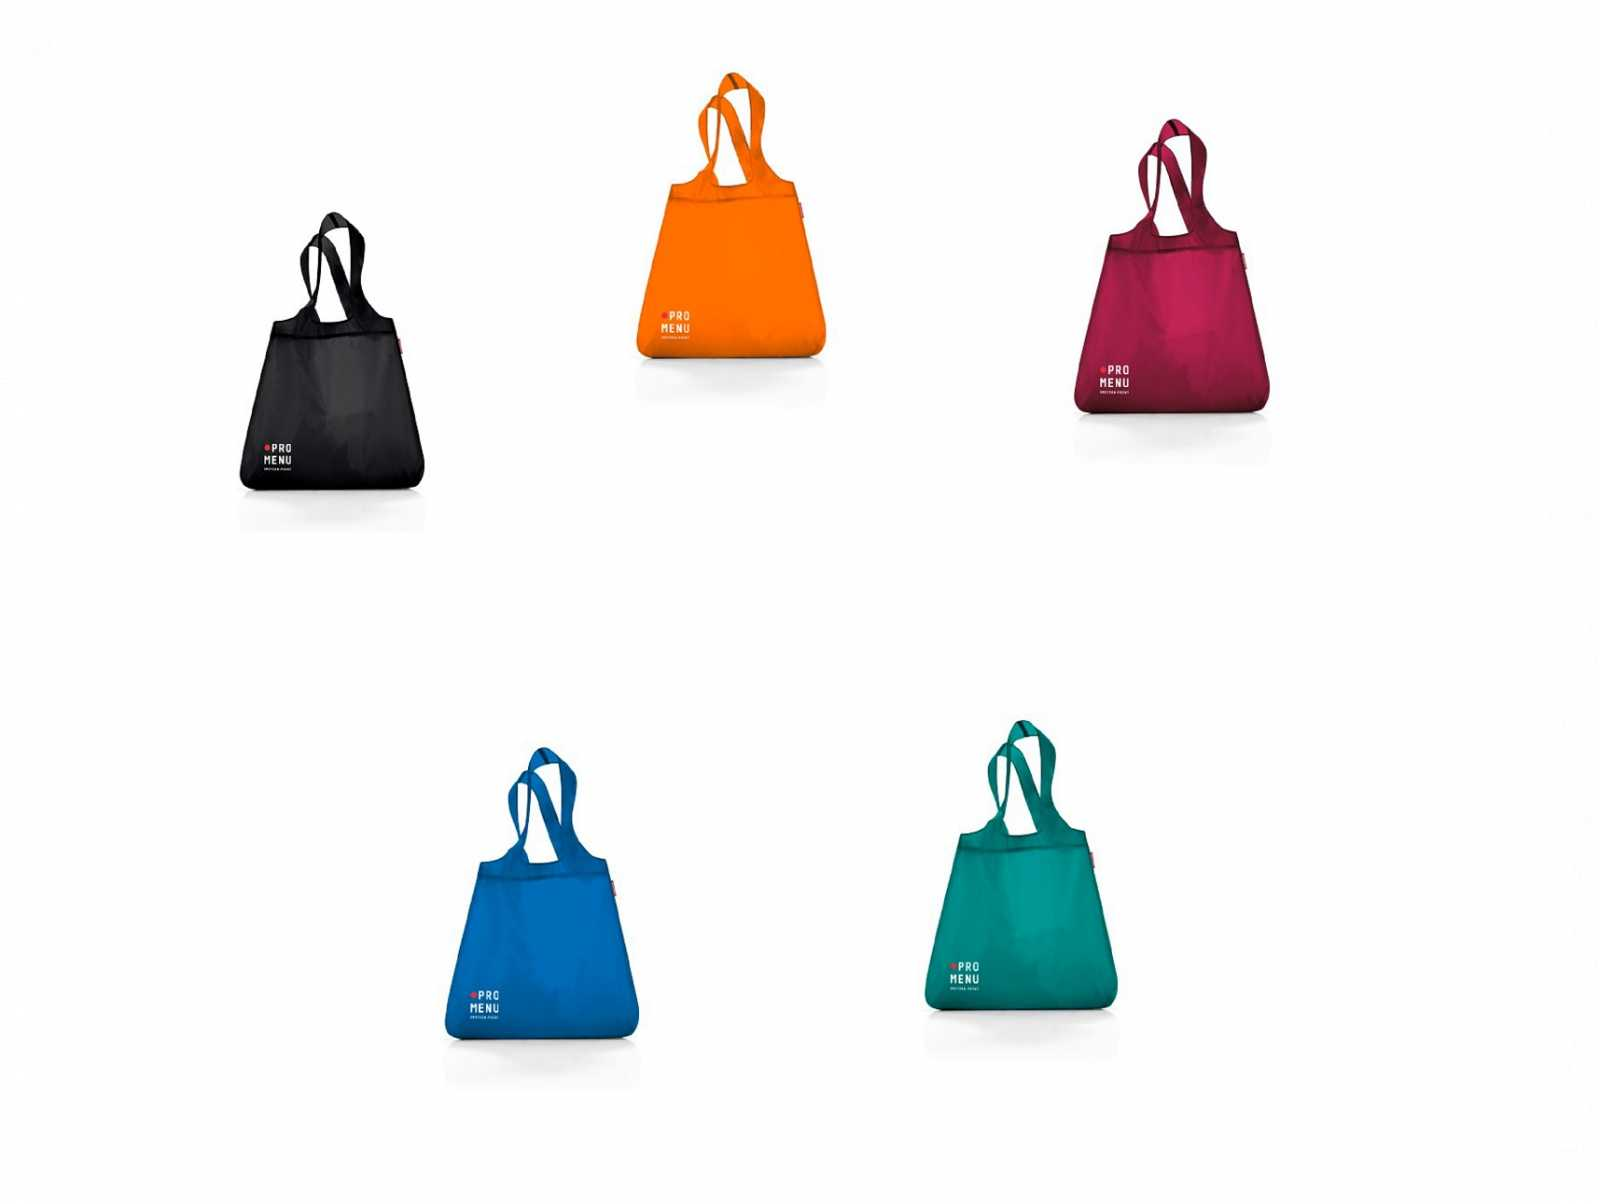 Онлайн каталог PROMENU: Сумка для шоппинга с лого Promenu Reisenthel Mini maxi shopper collection, 43,5 х 63 х 6 cм, цвет в ассортименте  AT 0002LOGO